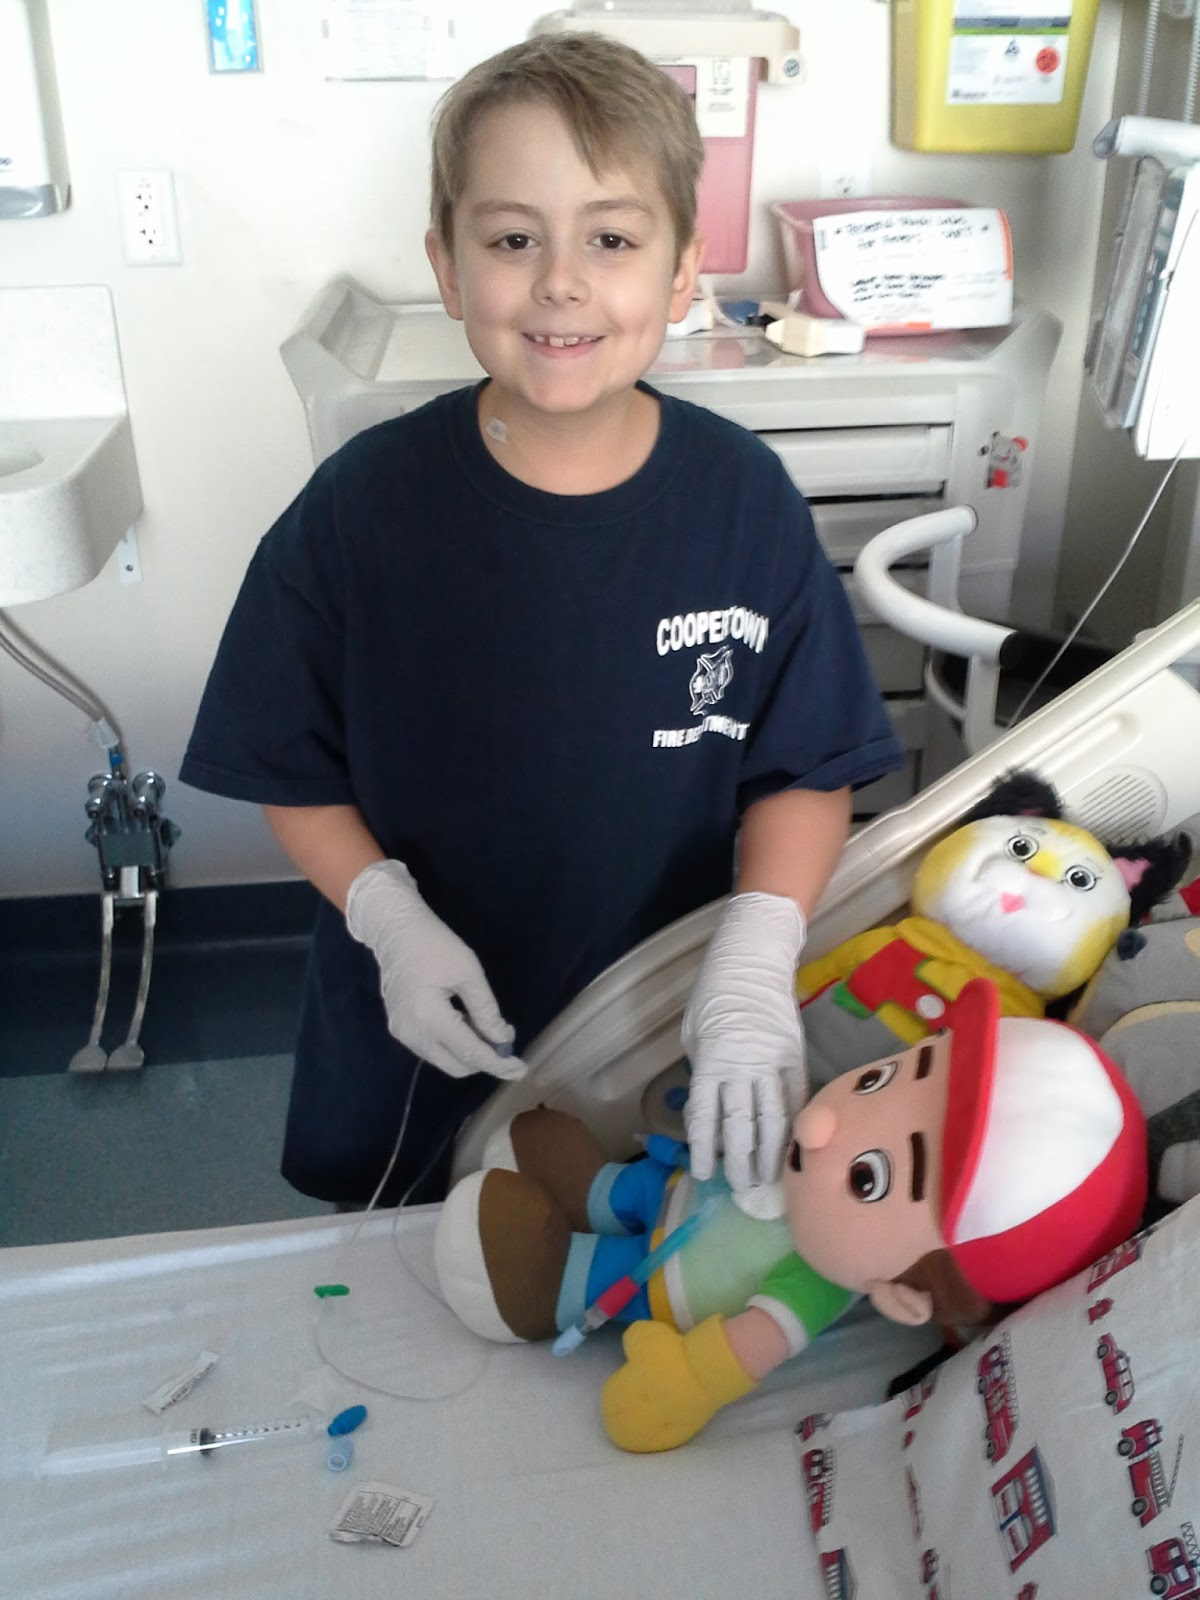 Dr. Ori examines Handy Manny